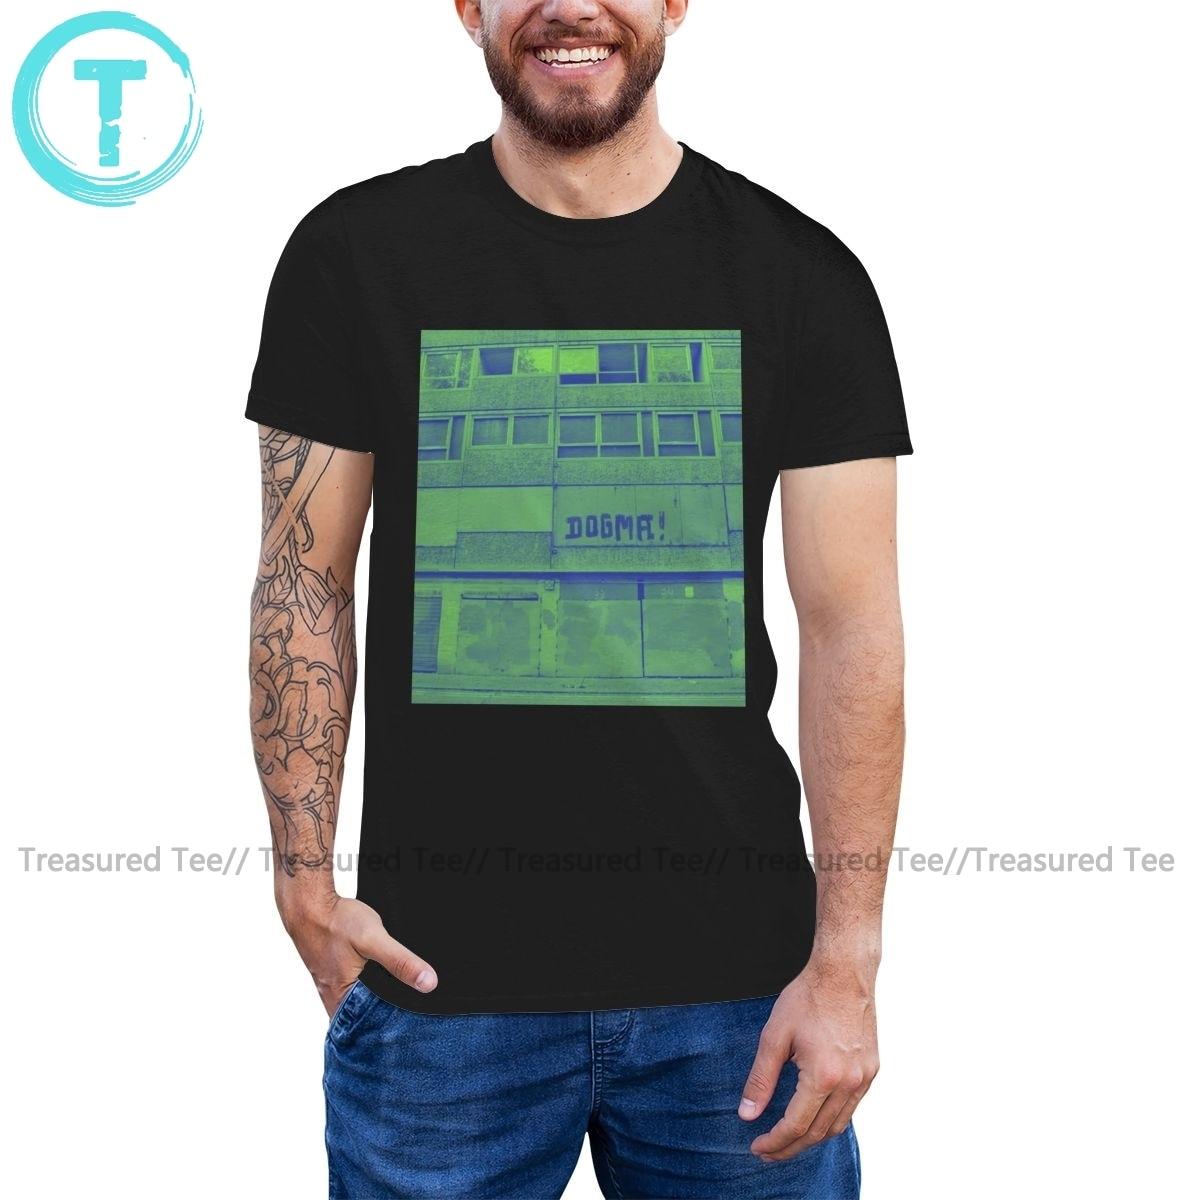 Dogma T Shirt Dogma T-Shirt Oversize Short Sleeves Tee Shirt Beach Funny Male Graphic Cotton Tshirt